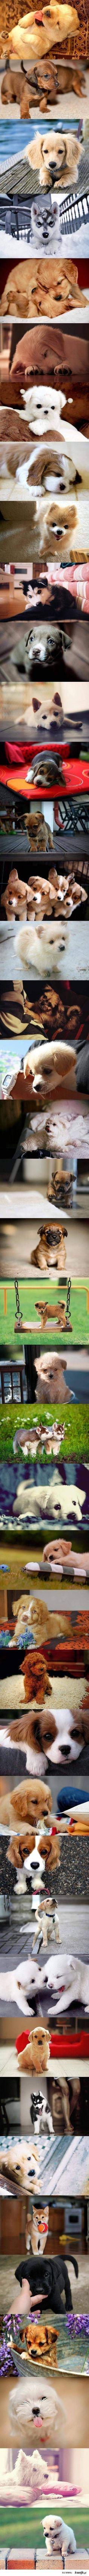 Lots of dogs awww, anim, puppies, stuff, pet, doggi, cuti, ador, thing